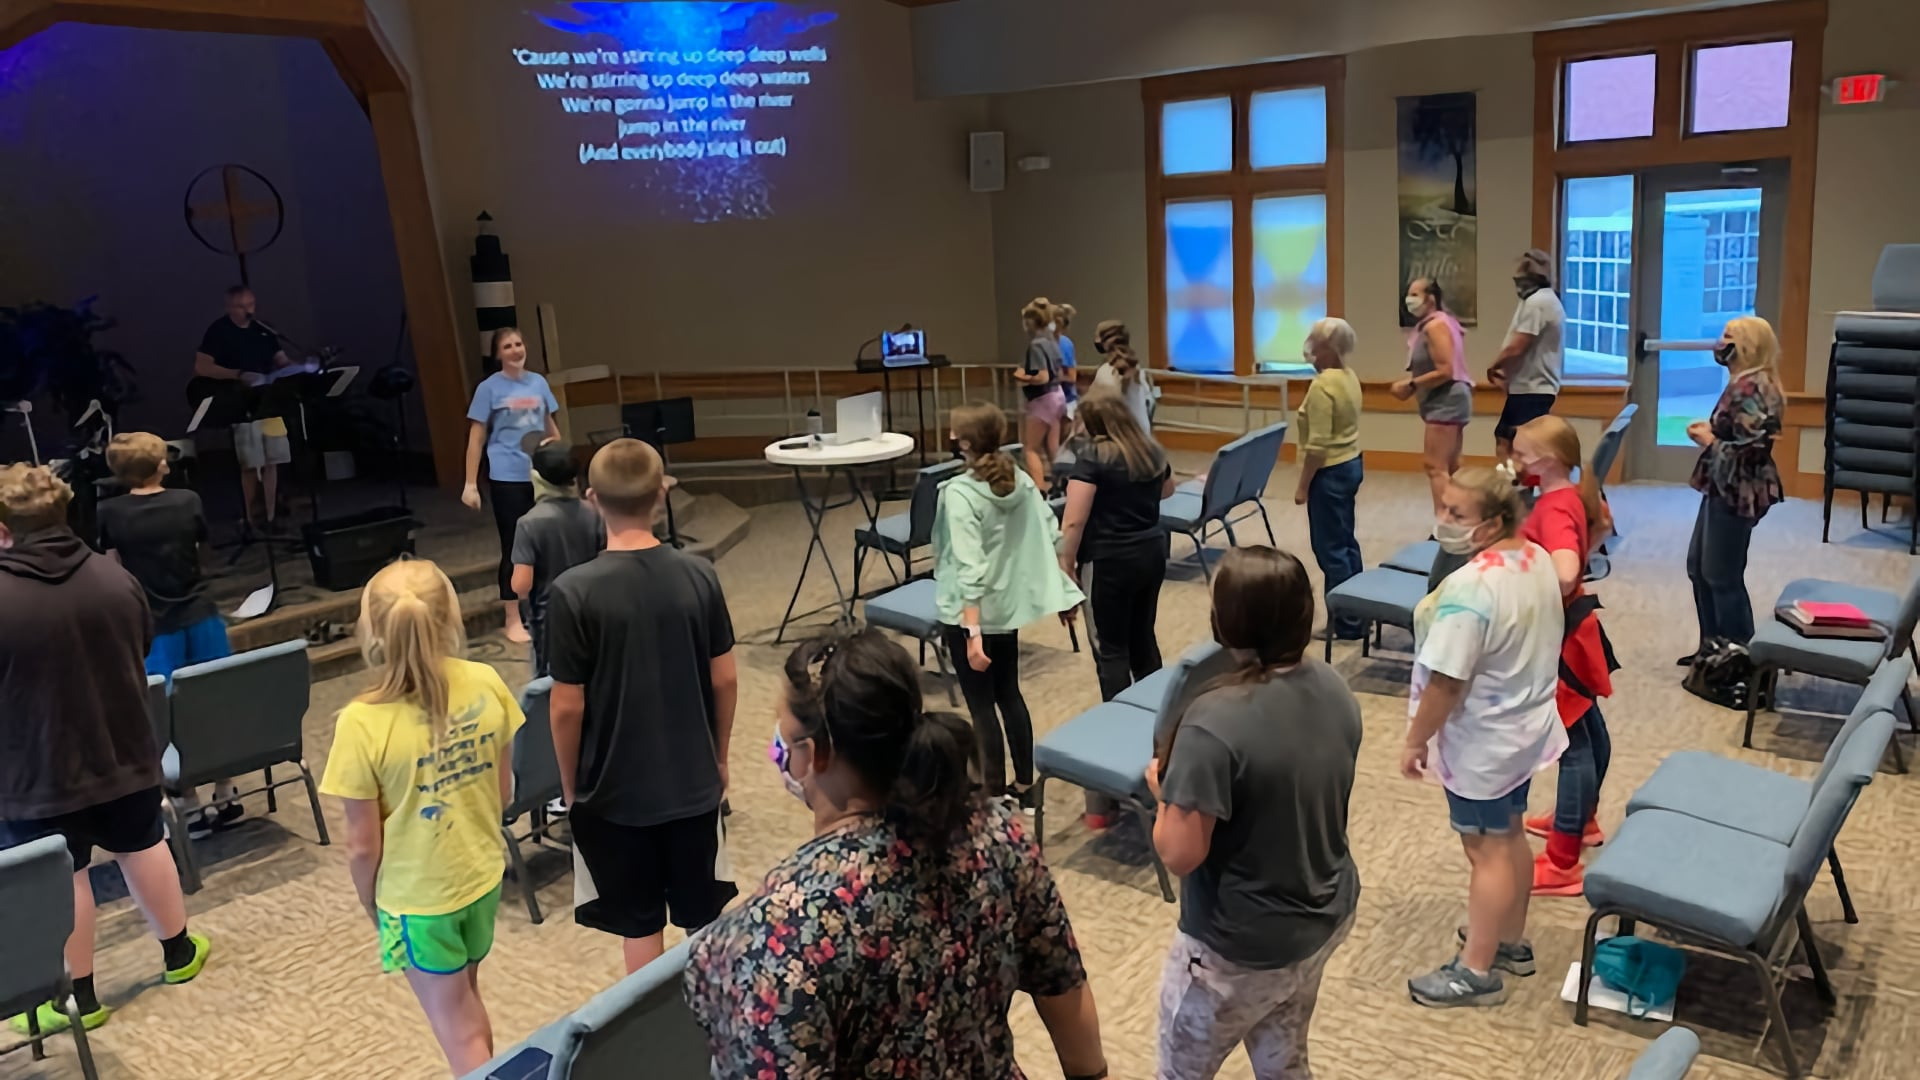 Olivet Youth Ministry in La Crosse, Wisconsin